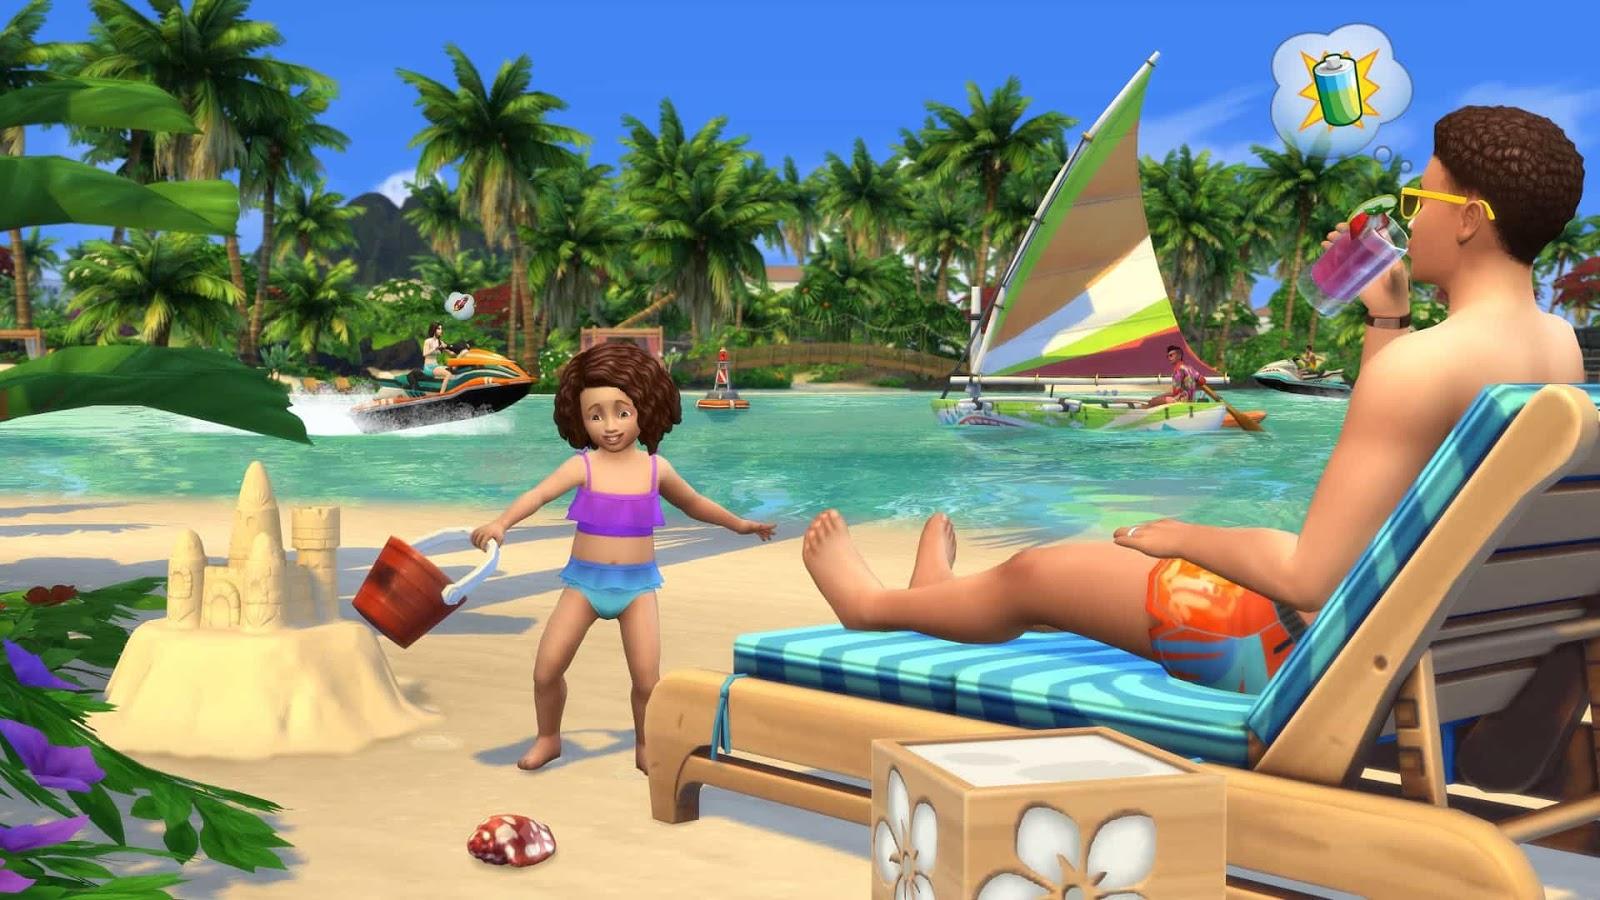 password The Sims 4 PC